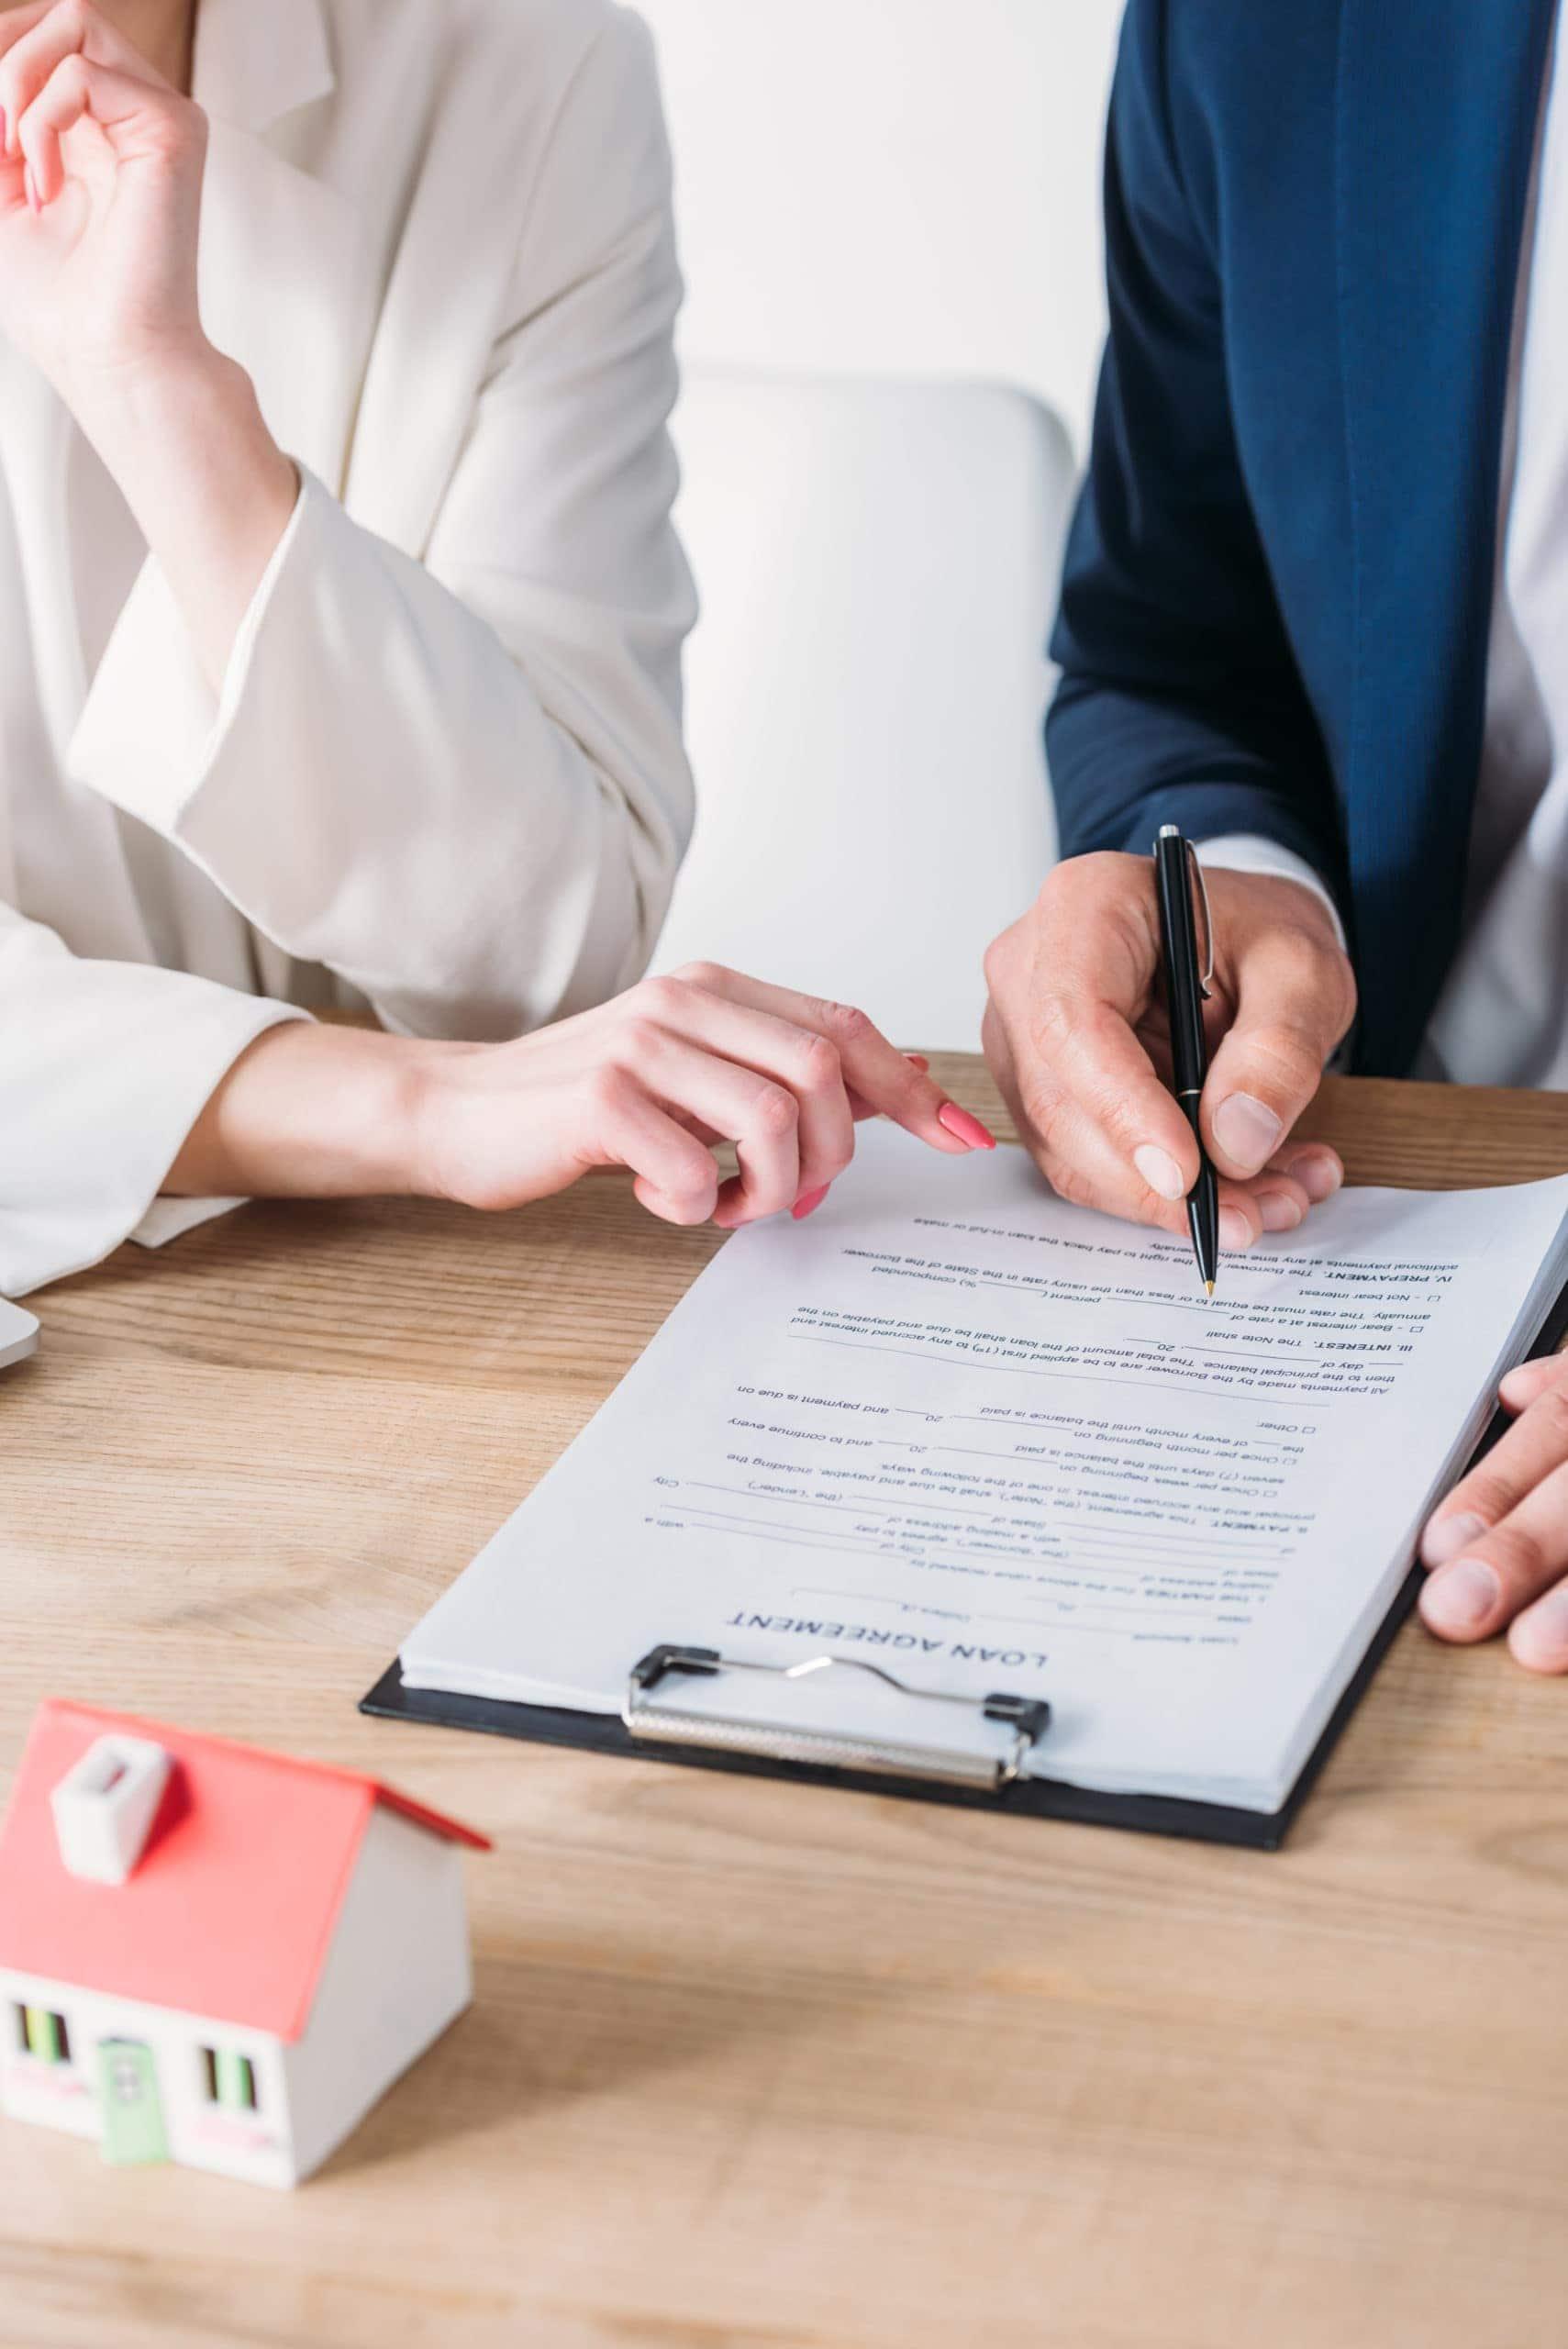 Residential Real Estate Law Greensboro North Carolina